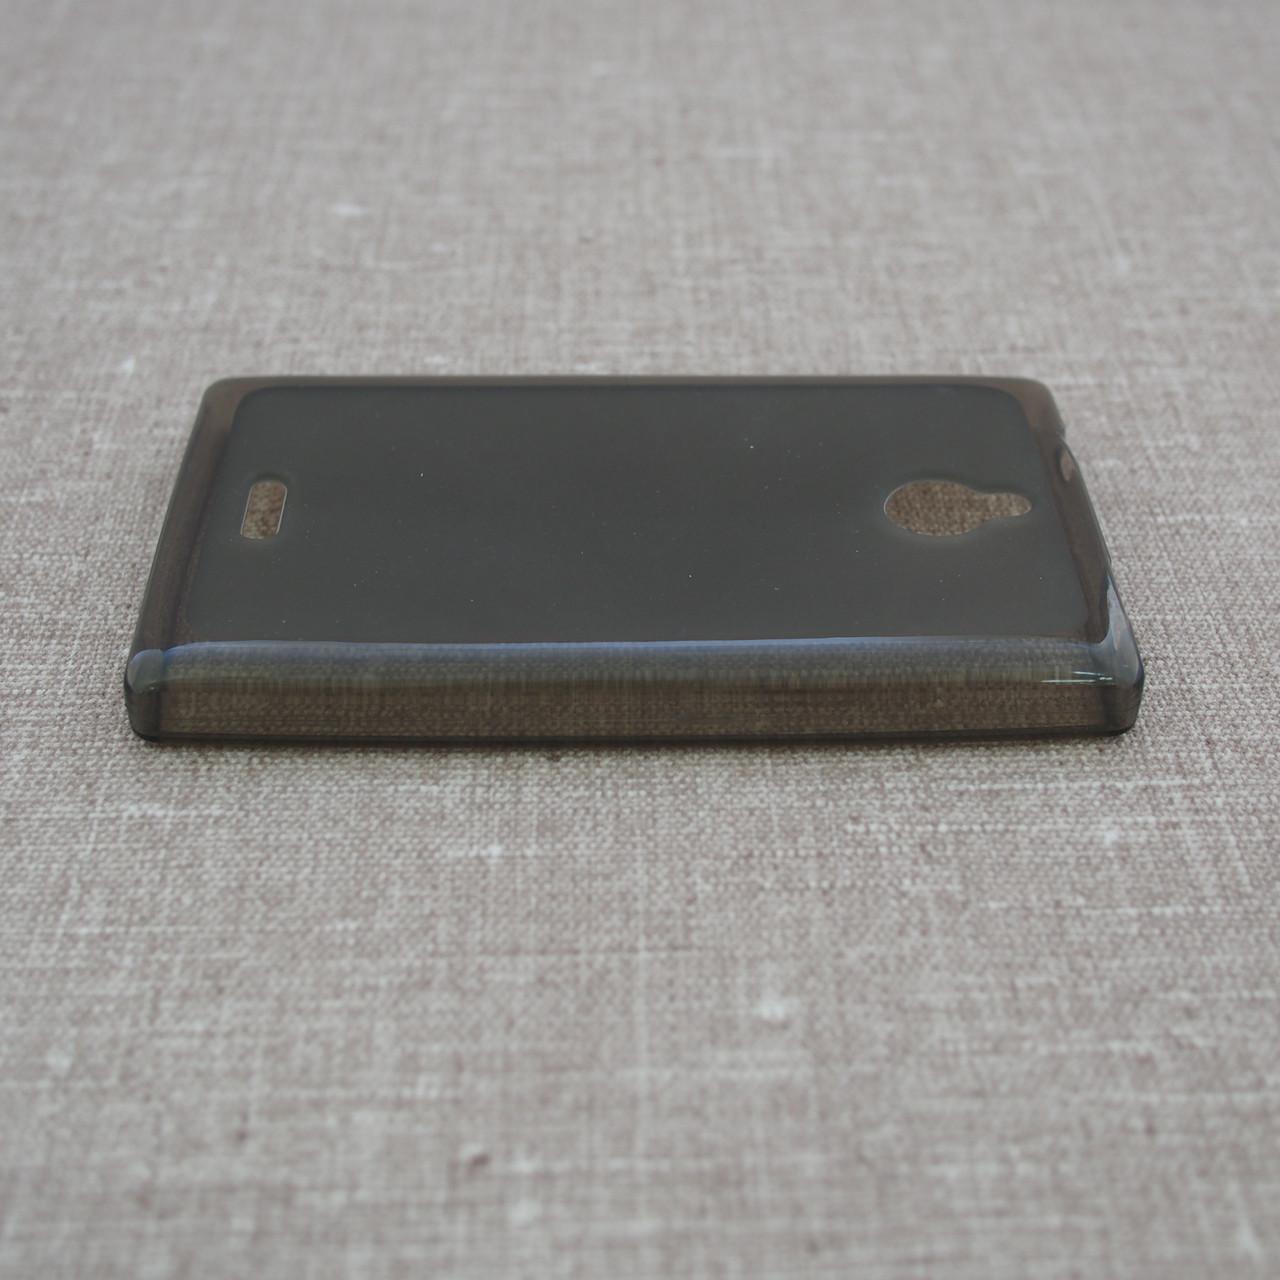 Epik TPU Nokia X2 grey Для телефона